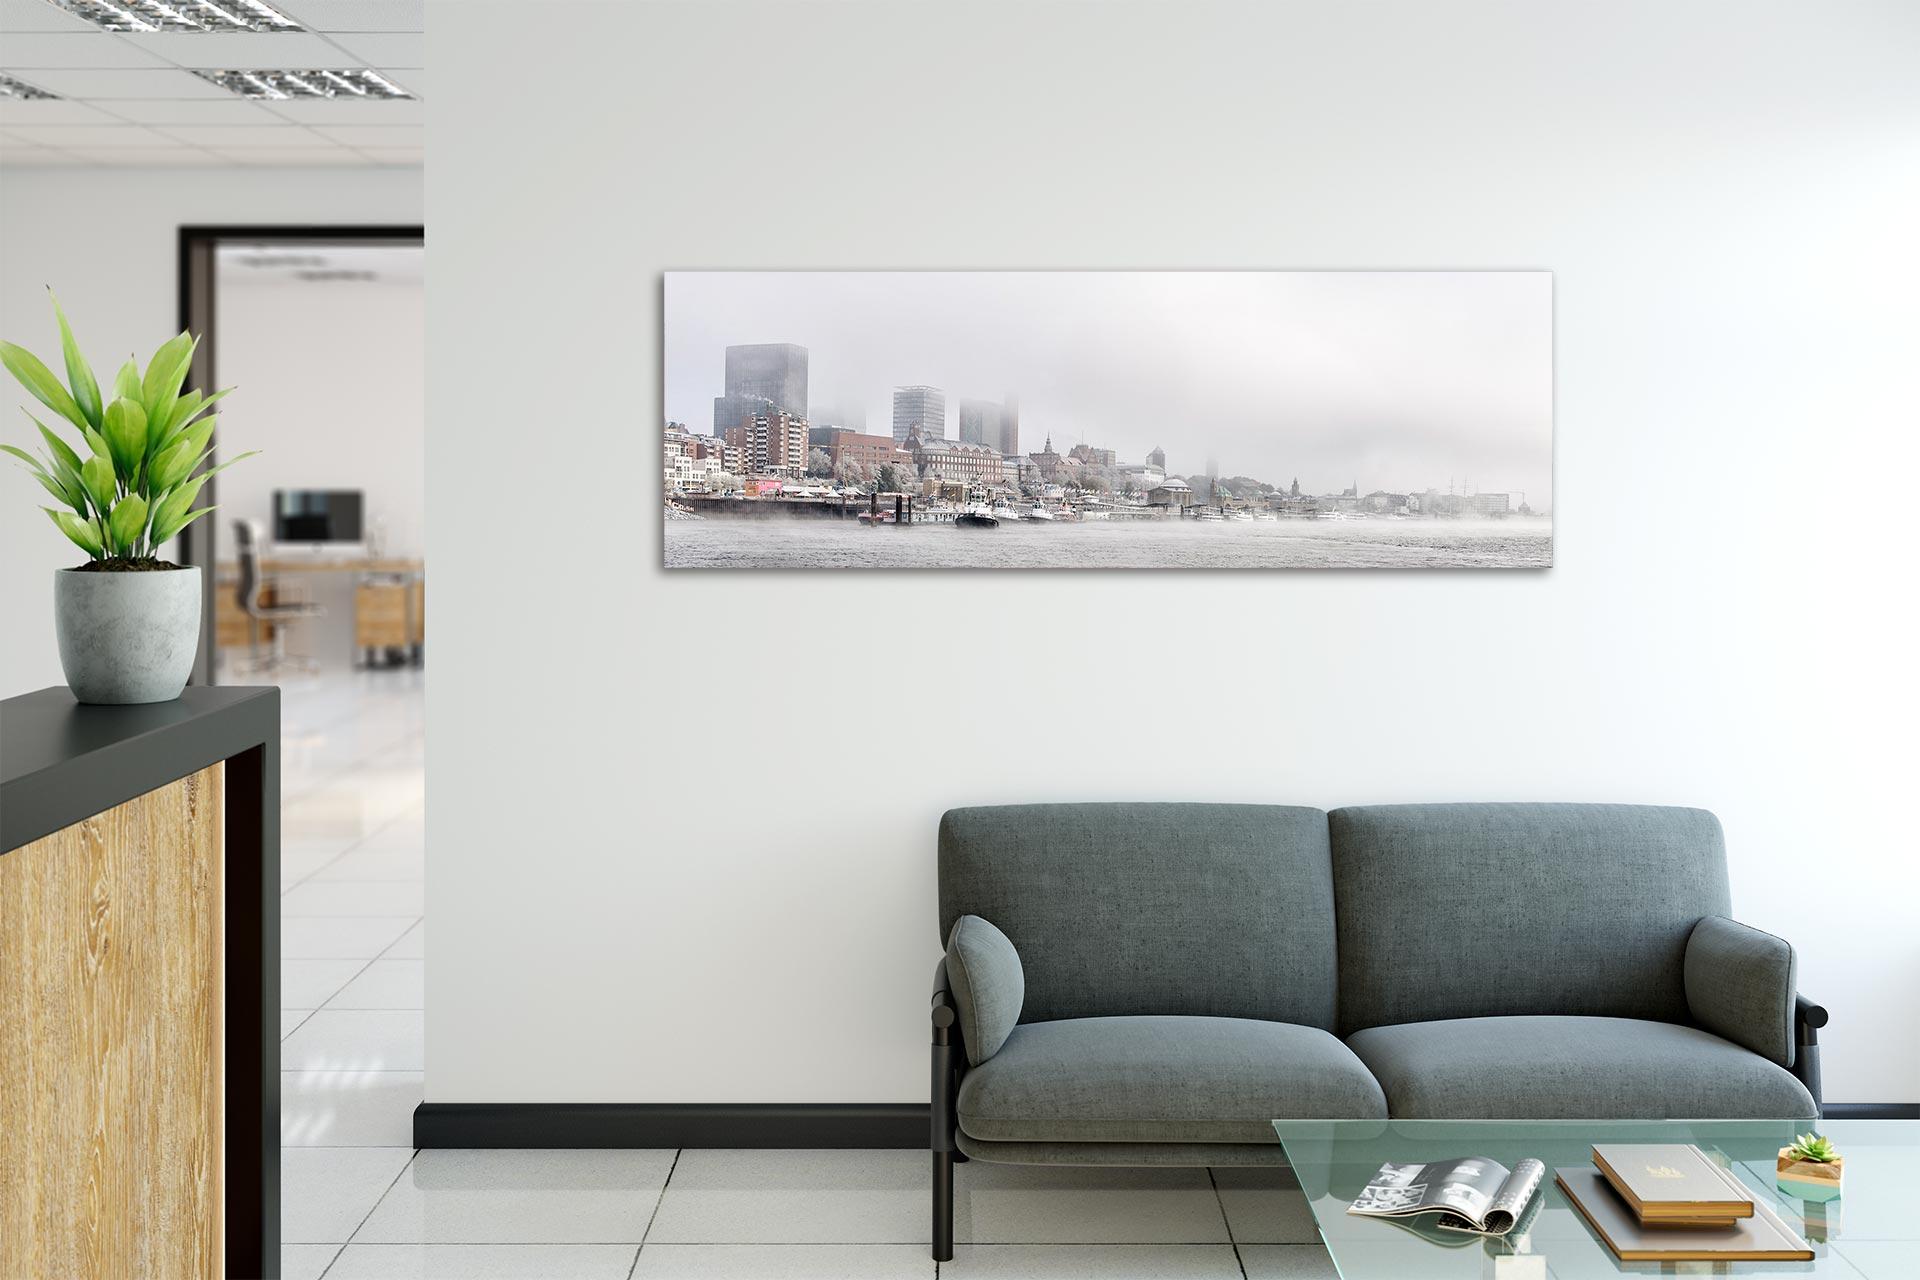 PSW102-panorama-hafen-leinwand-acrylglas-aludibond-empfang